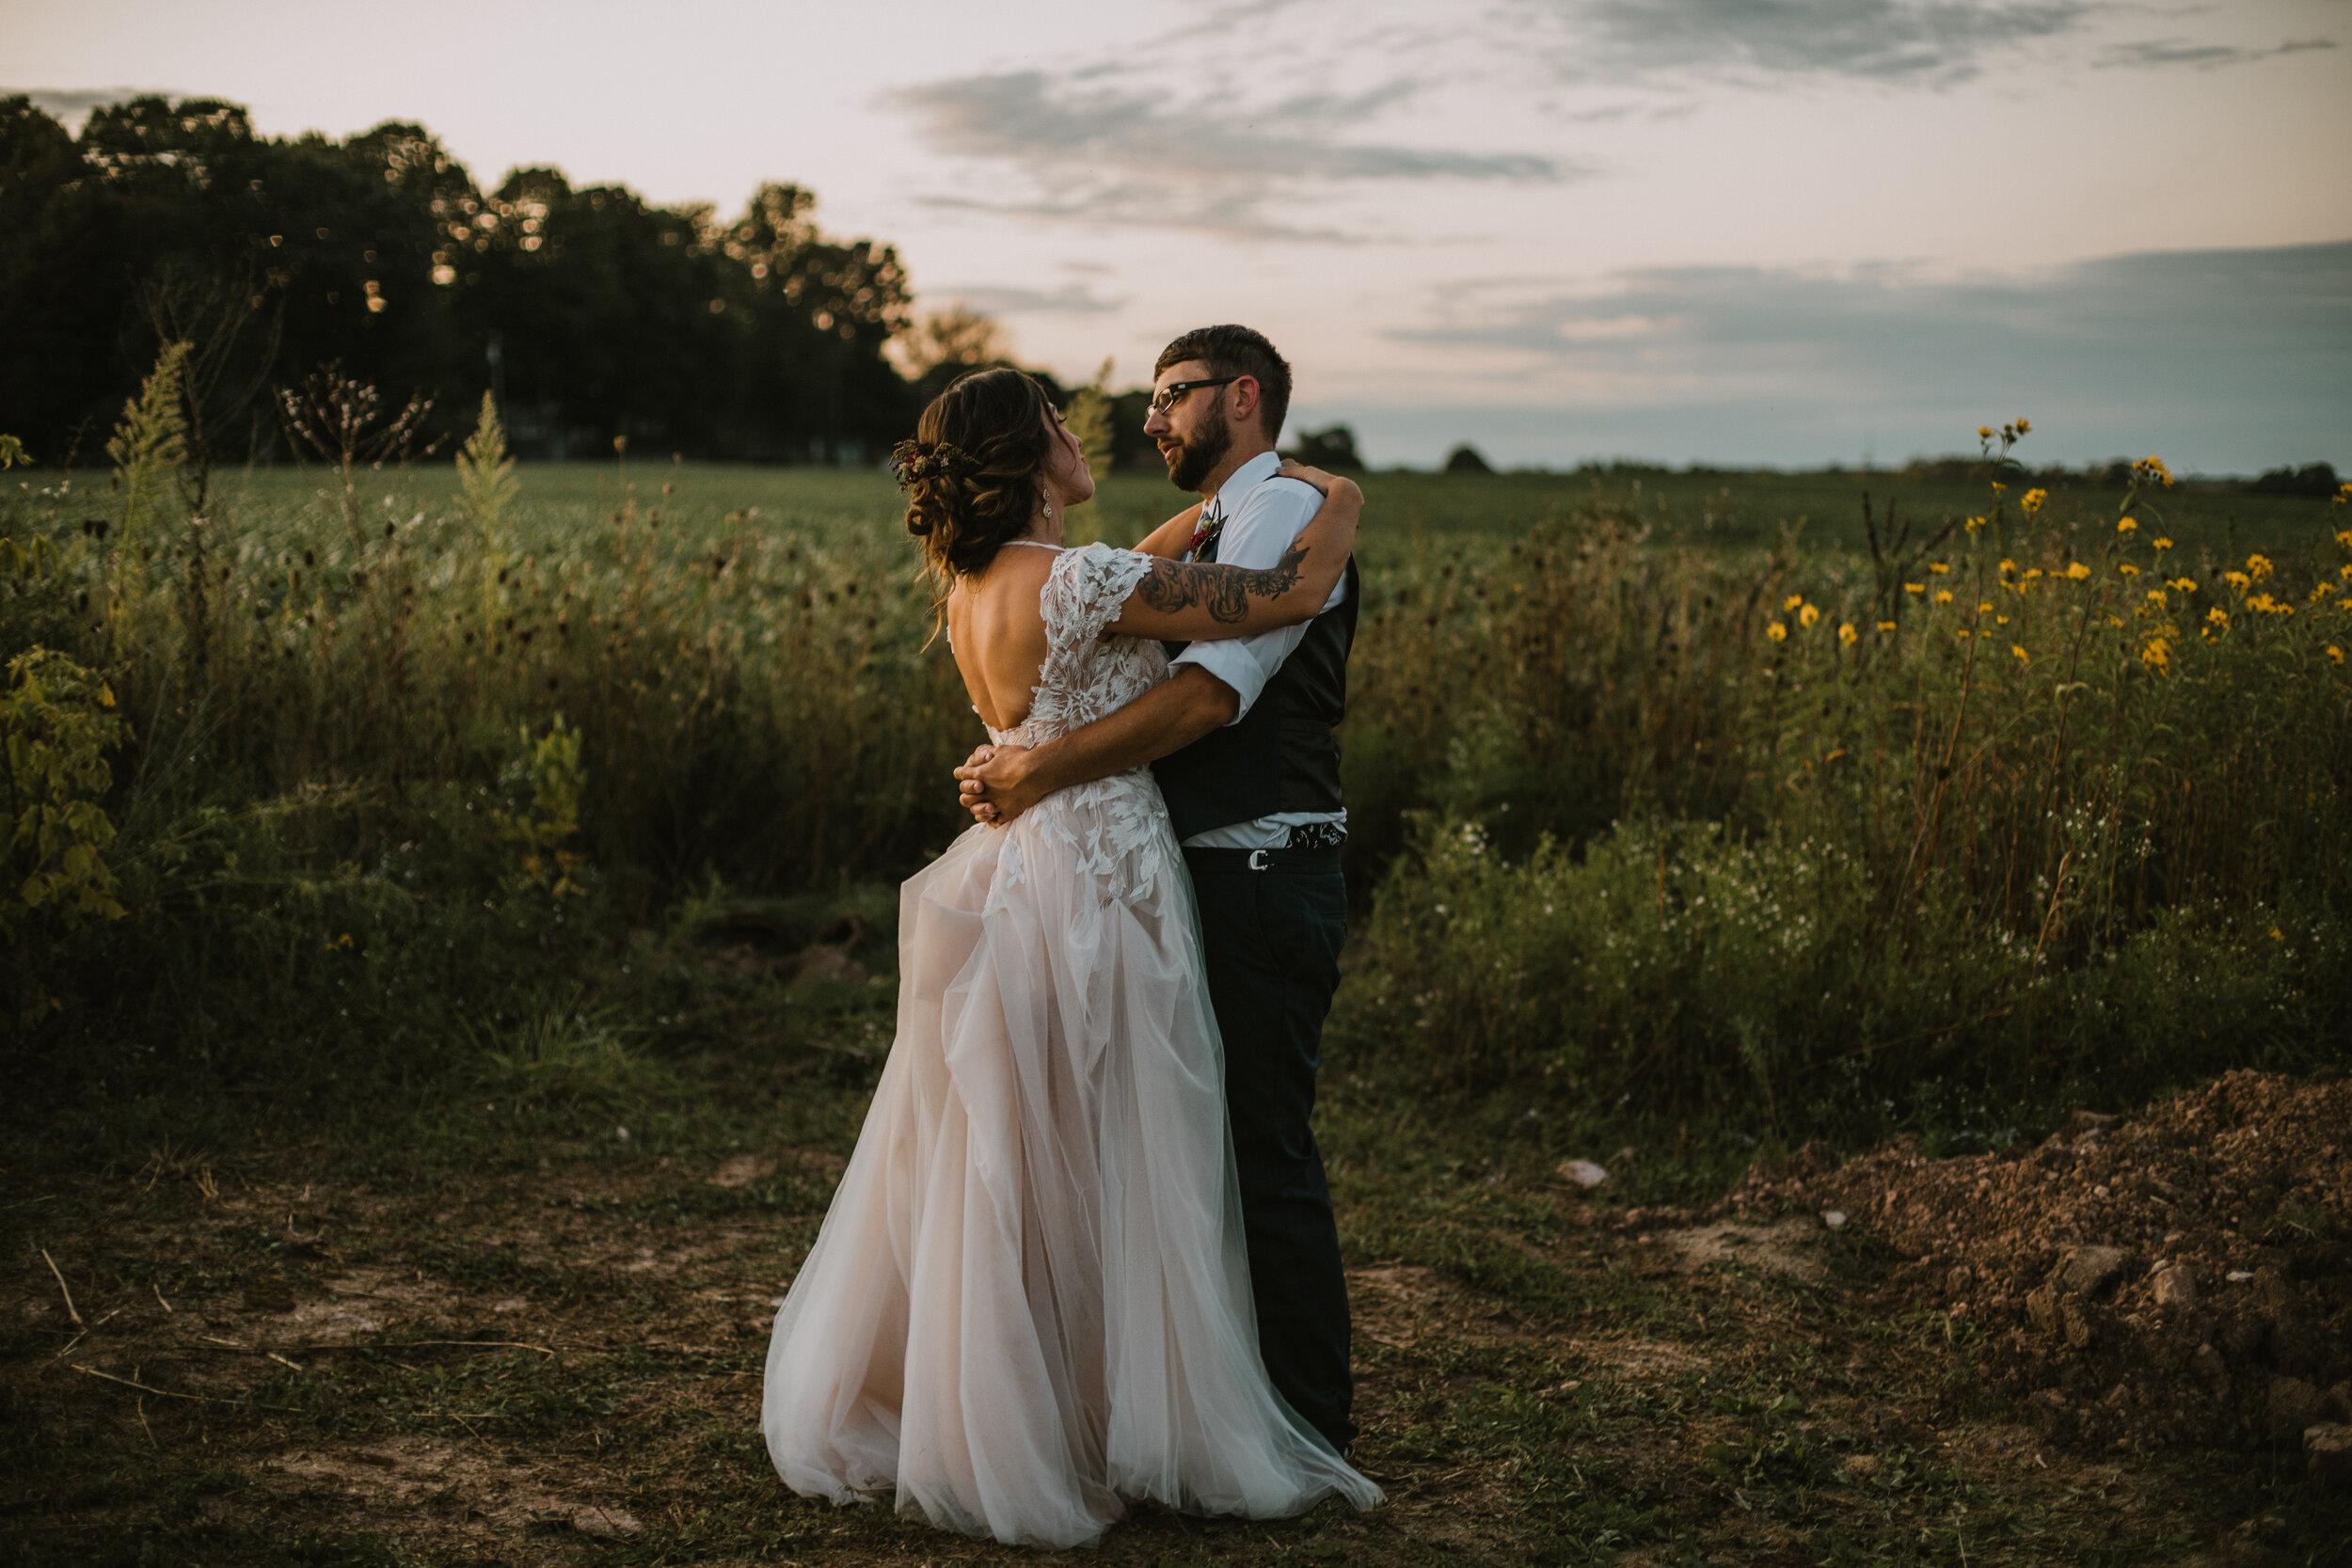 M&M-Sheboygan Wedding Photographer Videographer-955.jpg